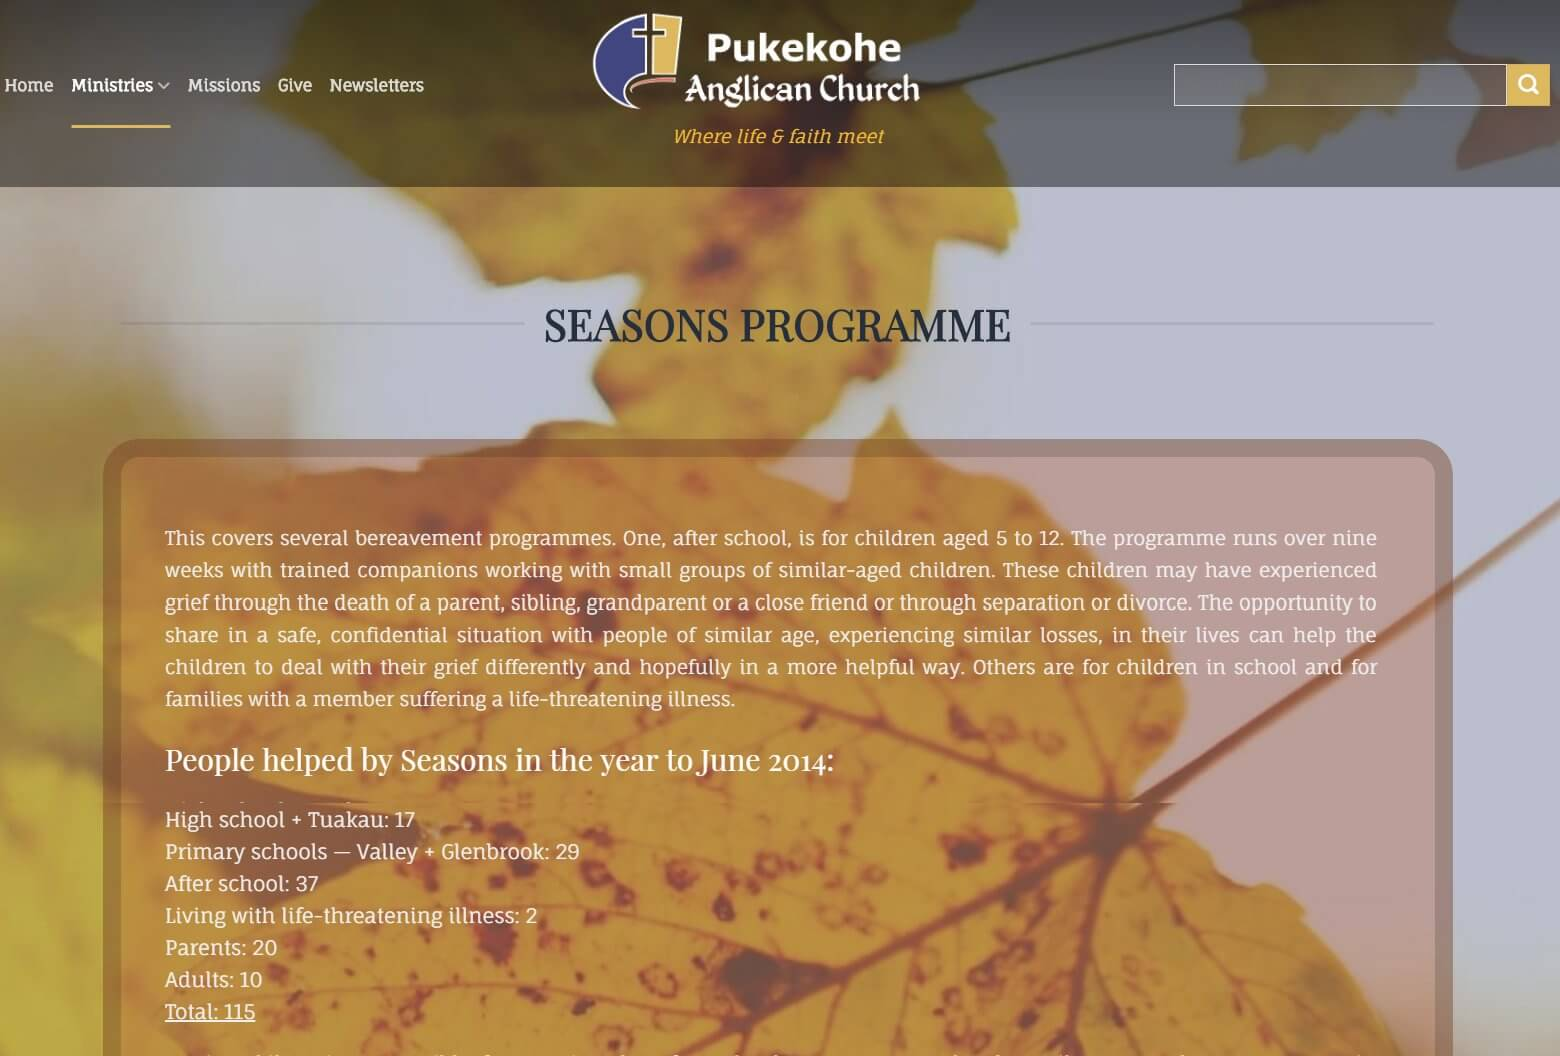 Seasons Programme